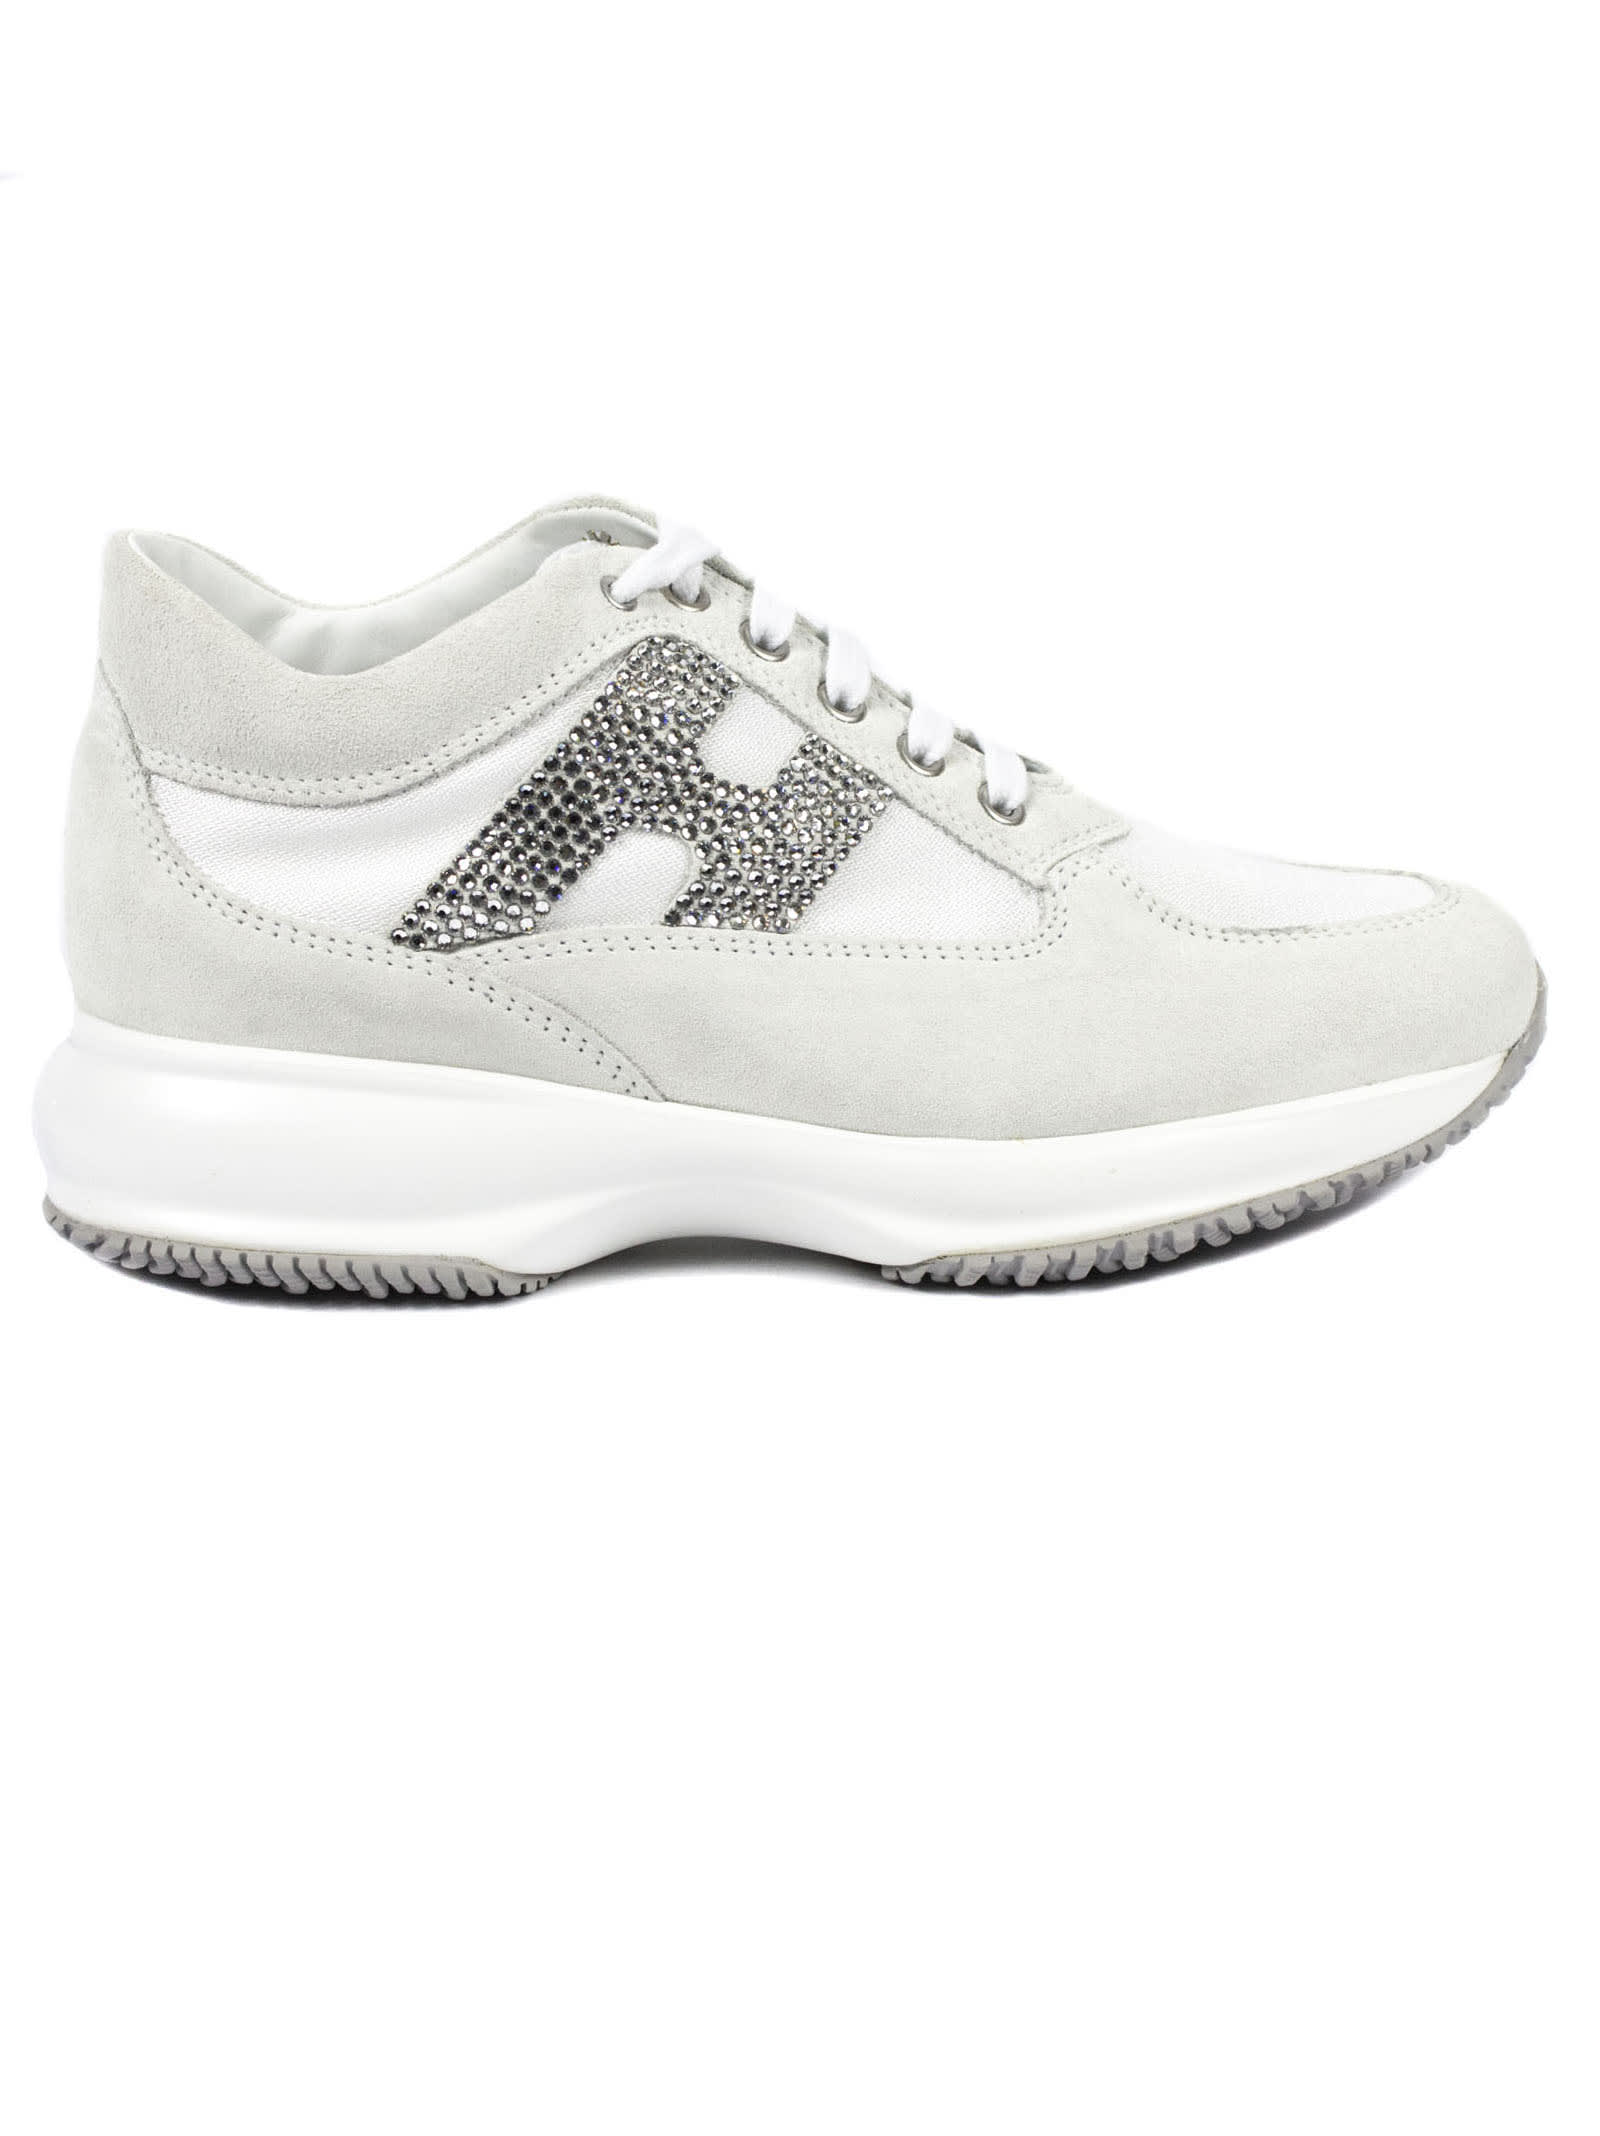 Hogan White Interactive Sneakers